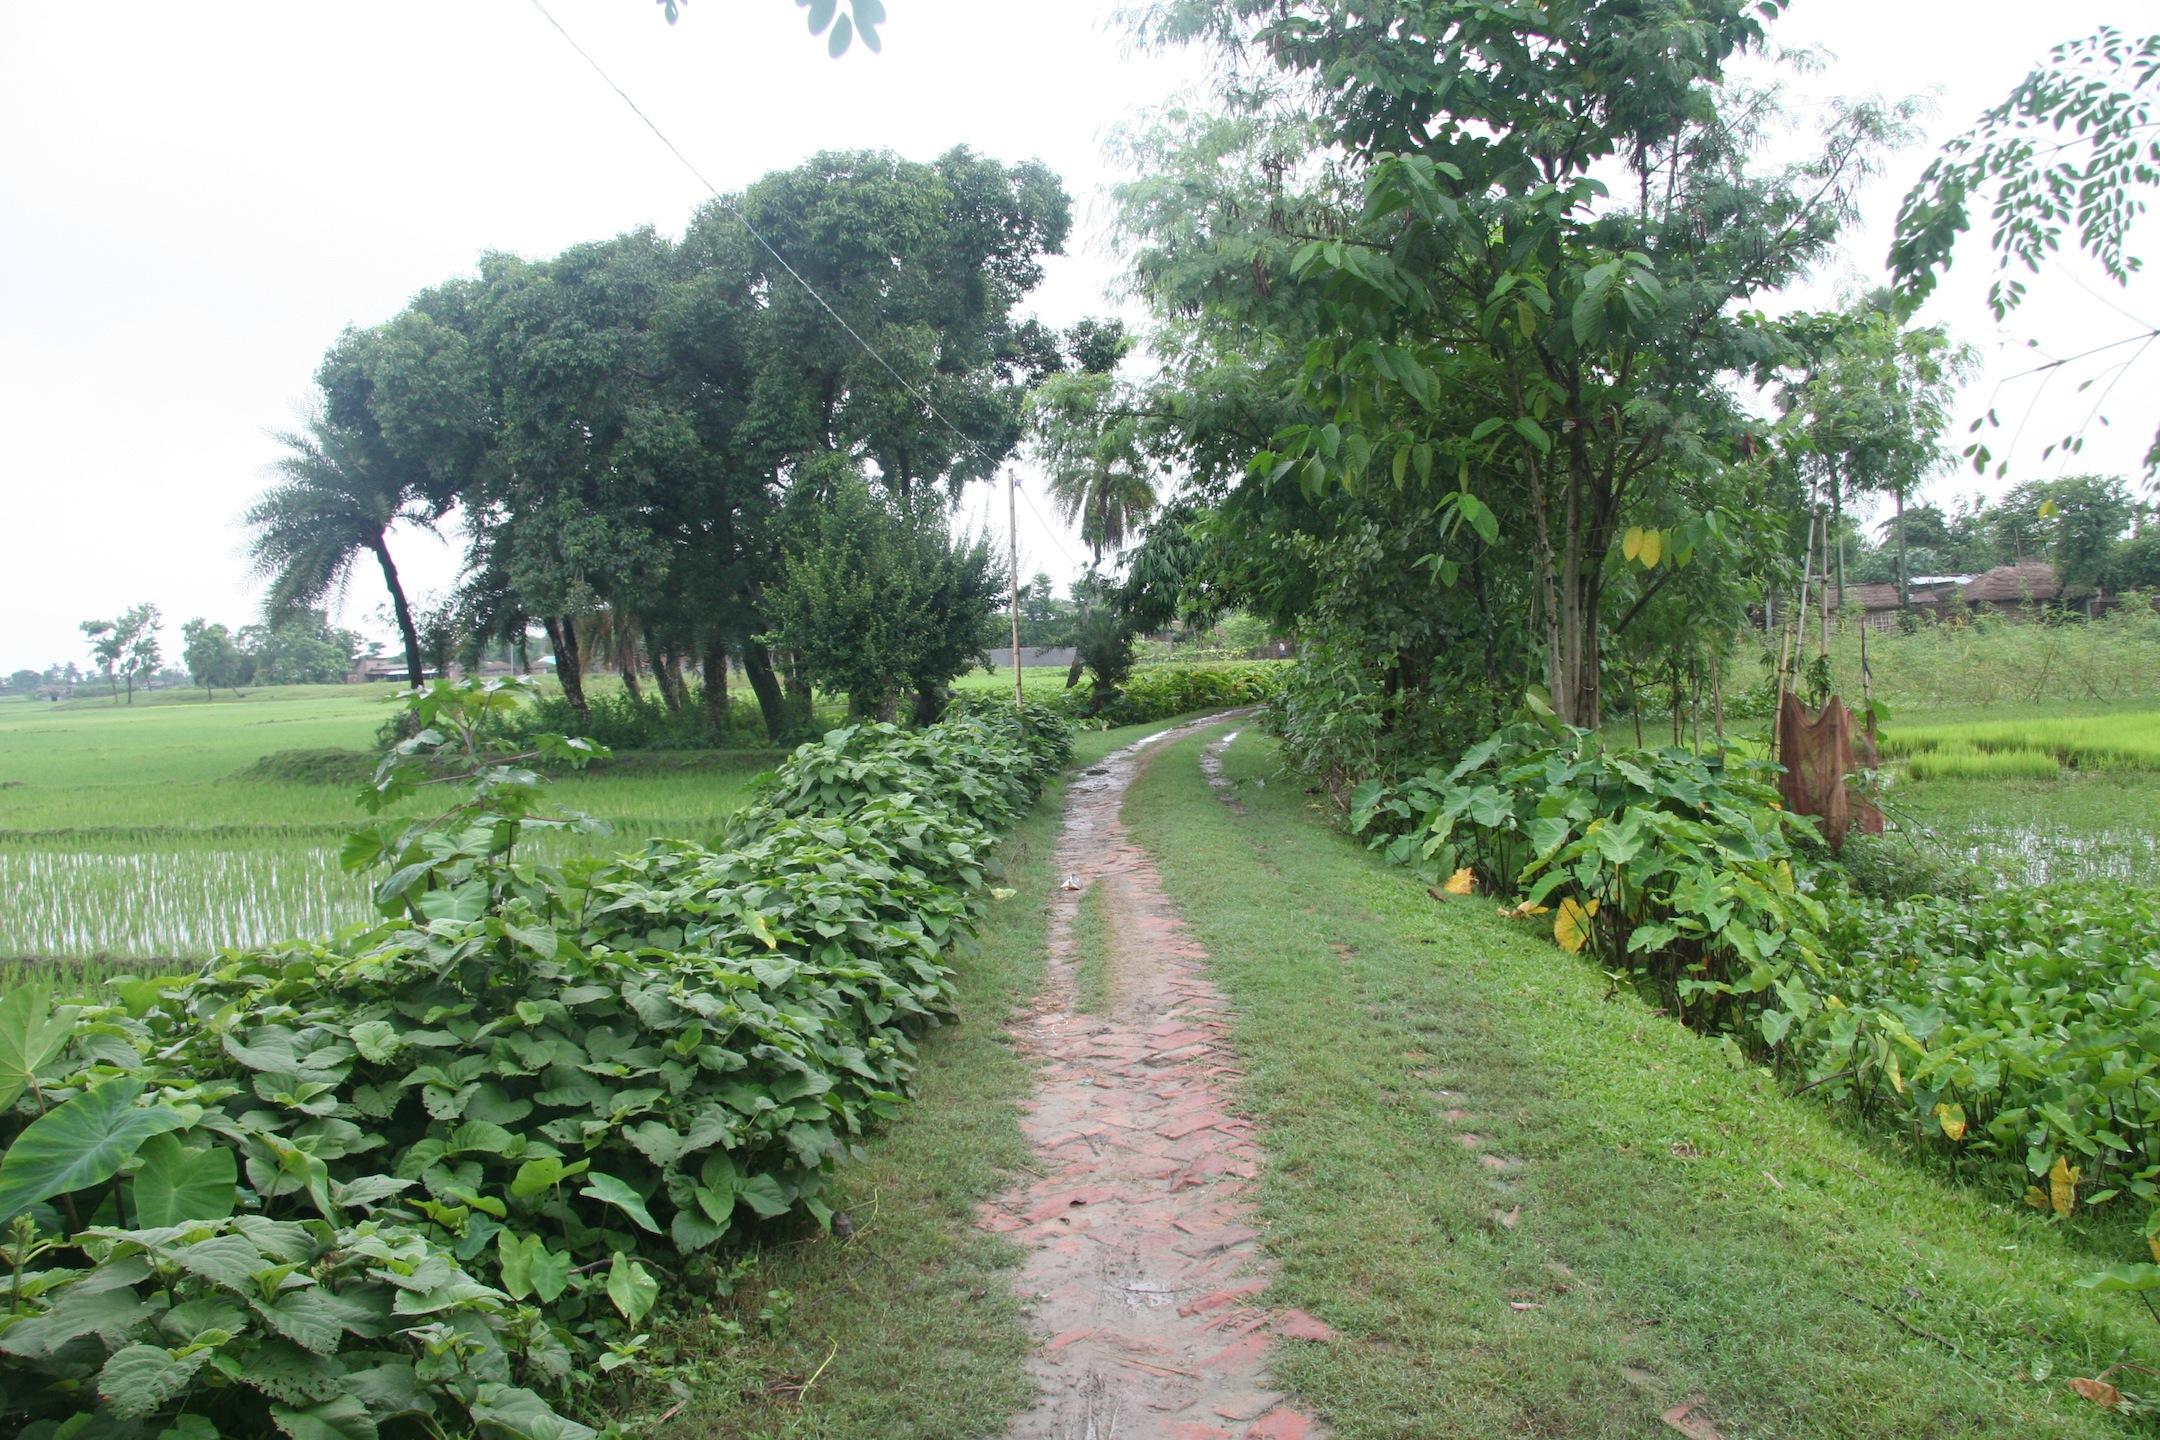 Road leading into Nimau Village